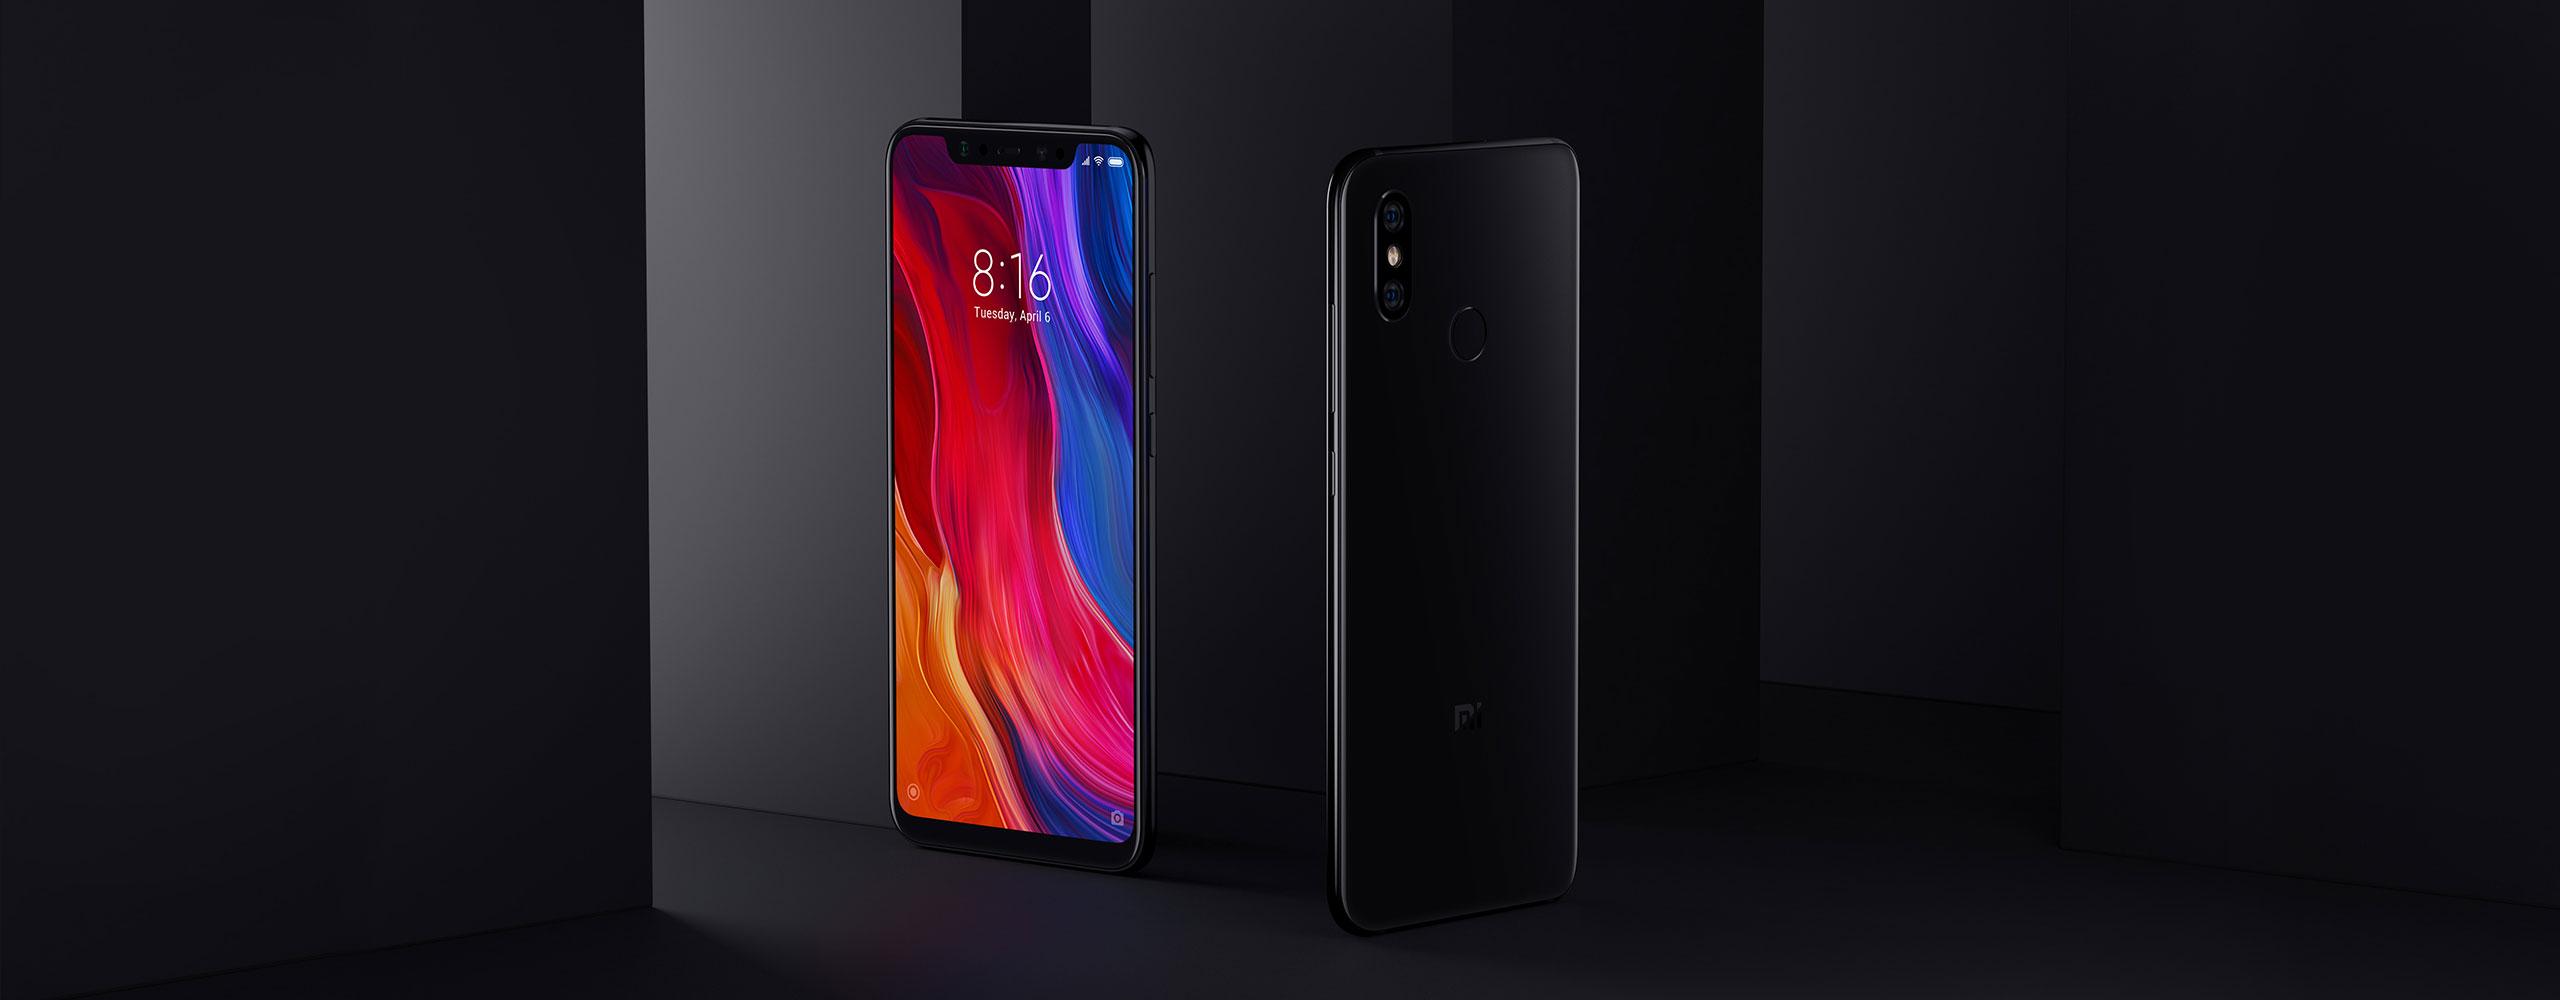 Xiaomi Mi 8 Snapdragon 845